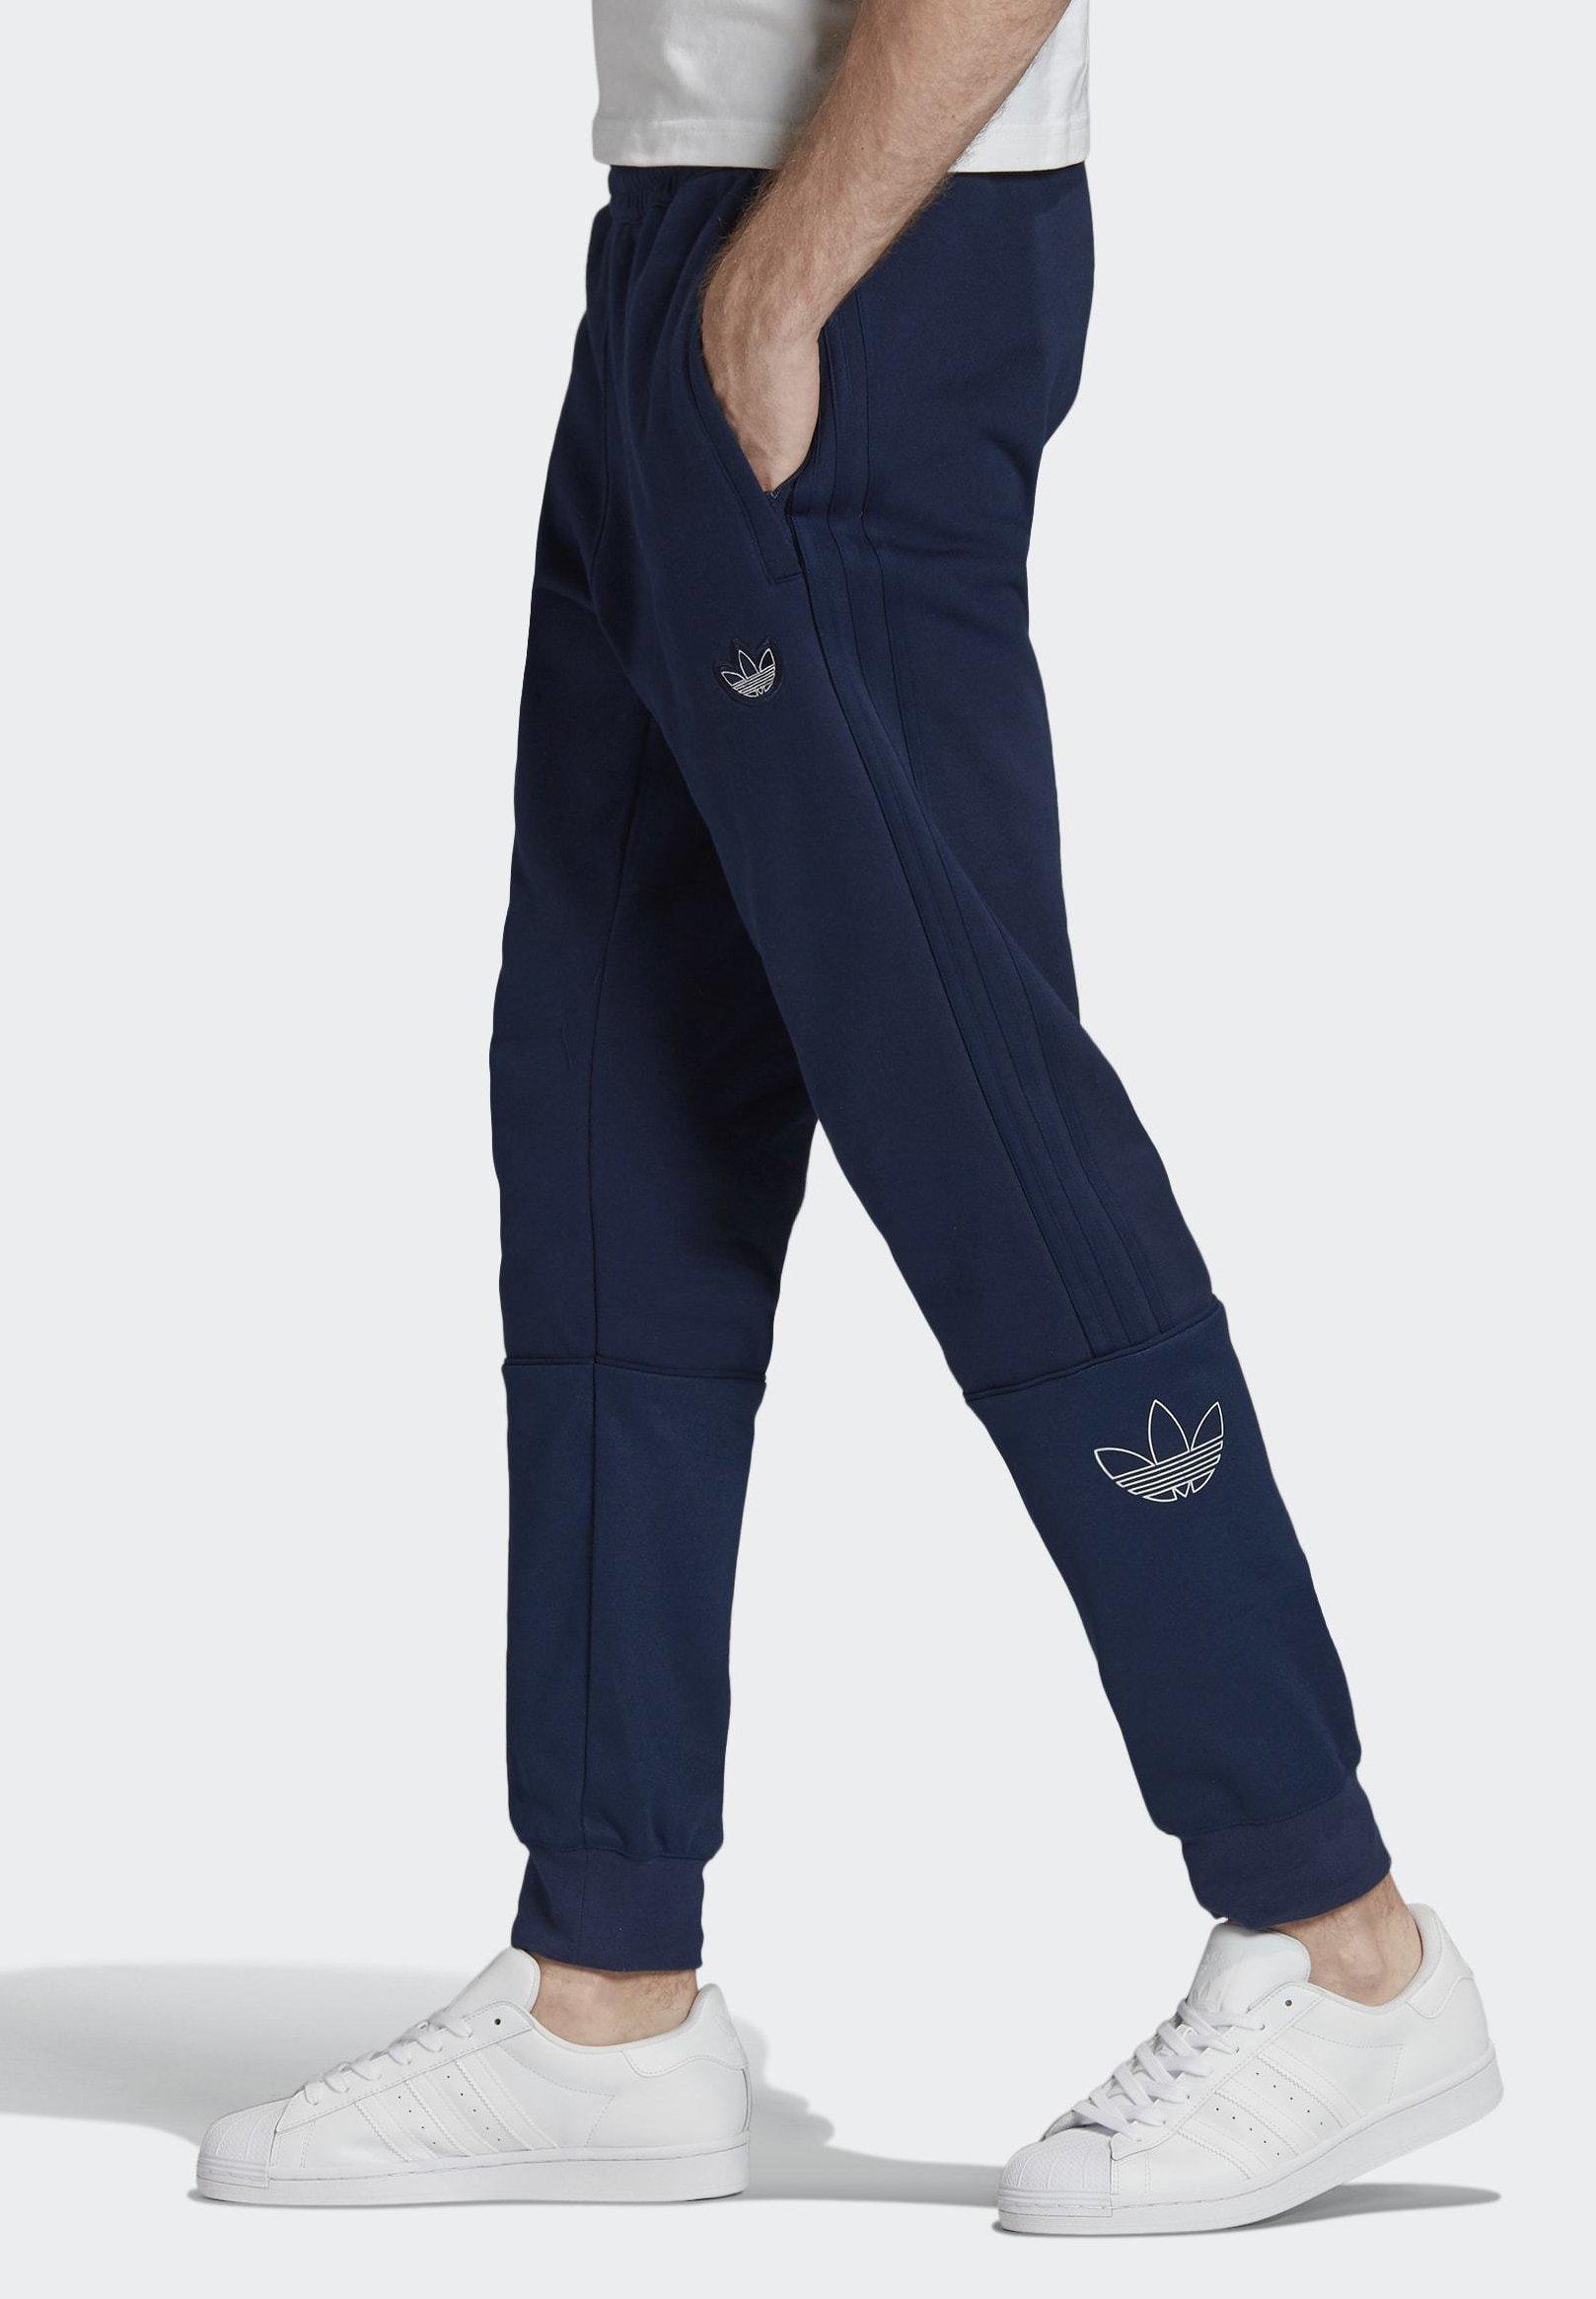 Adidas Originals Silver Foil Outline Joggers - Träningsbyxor Blue